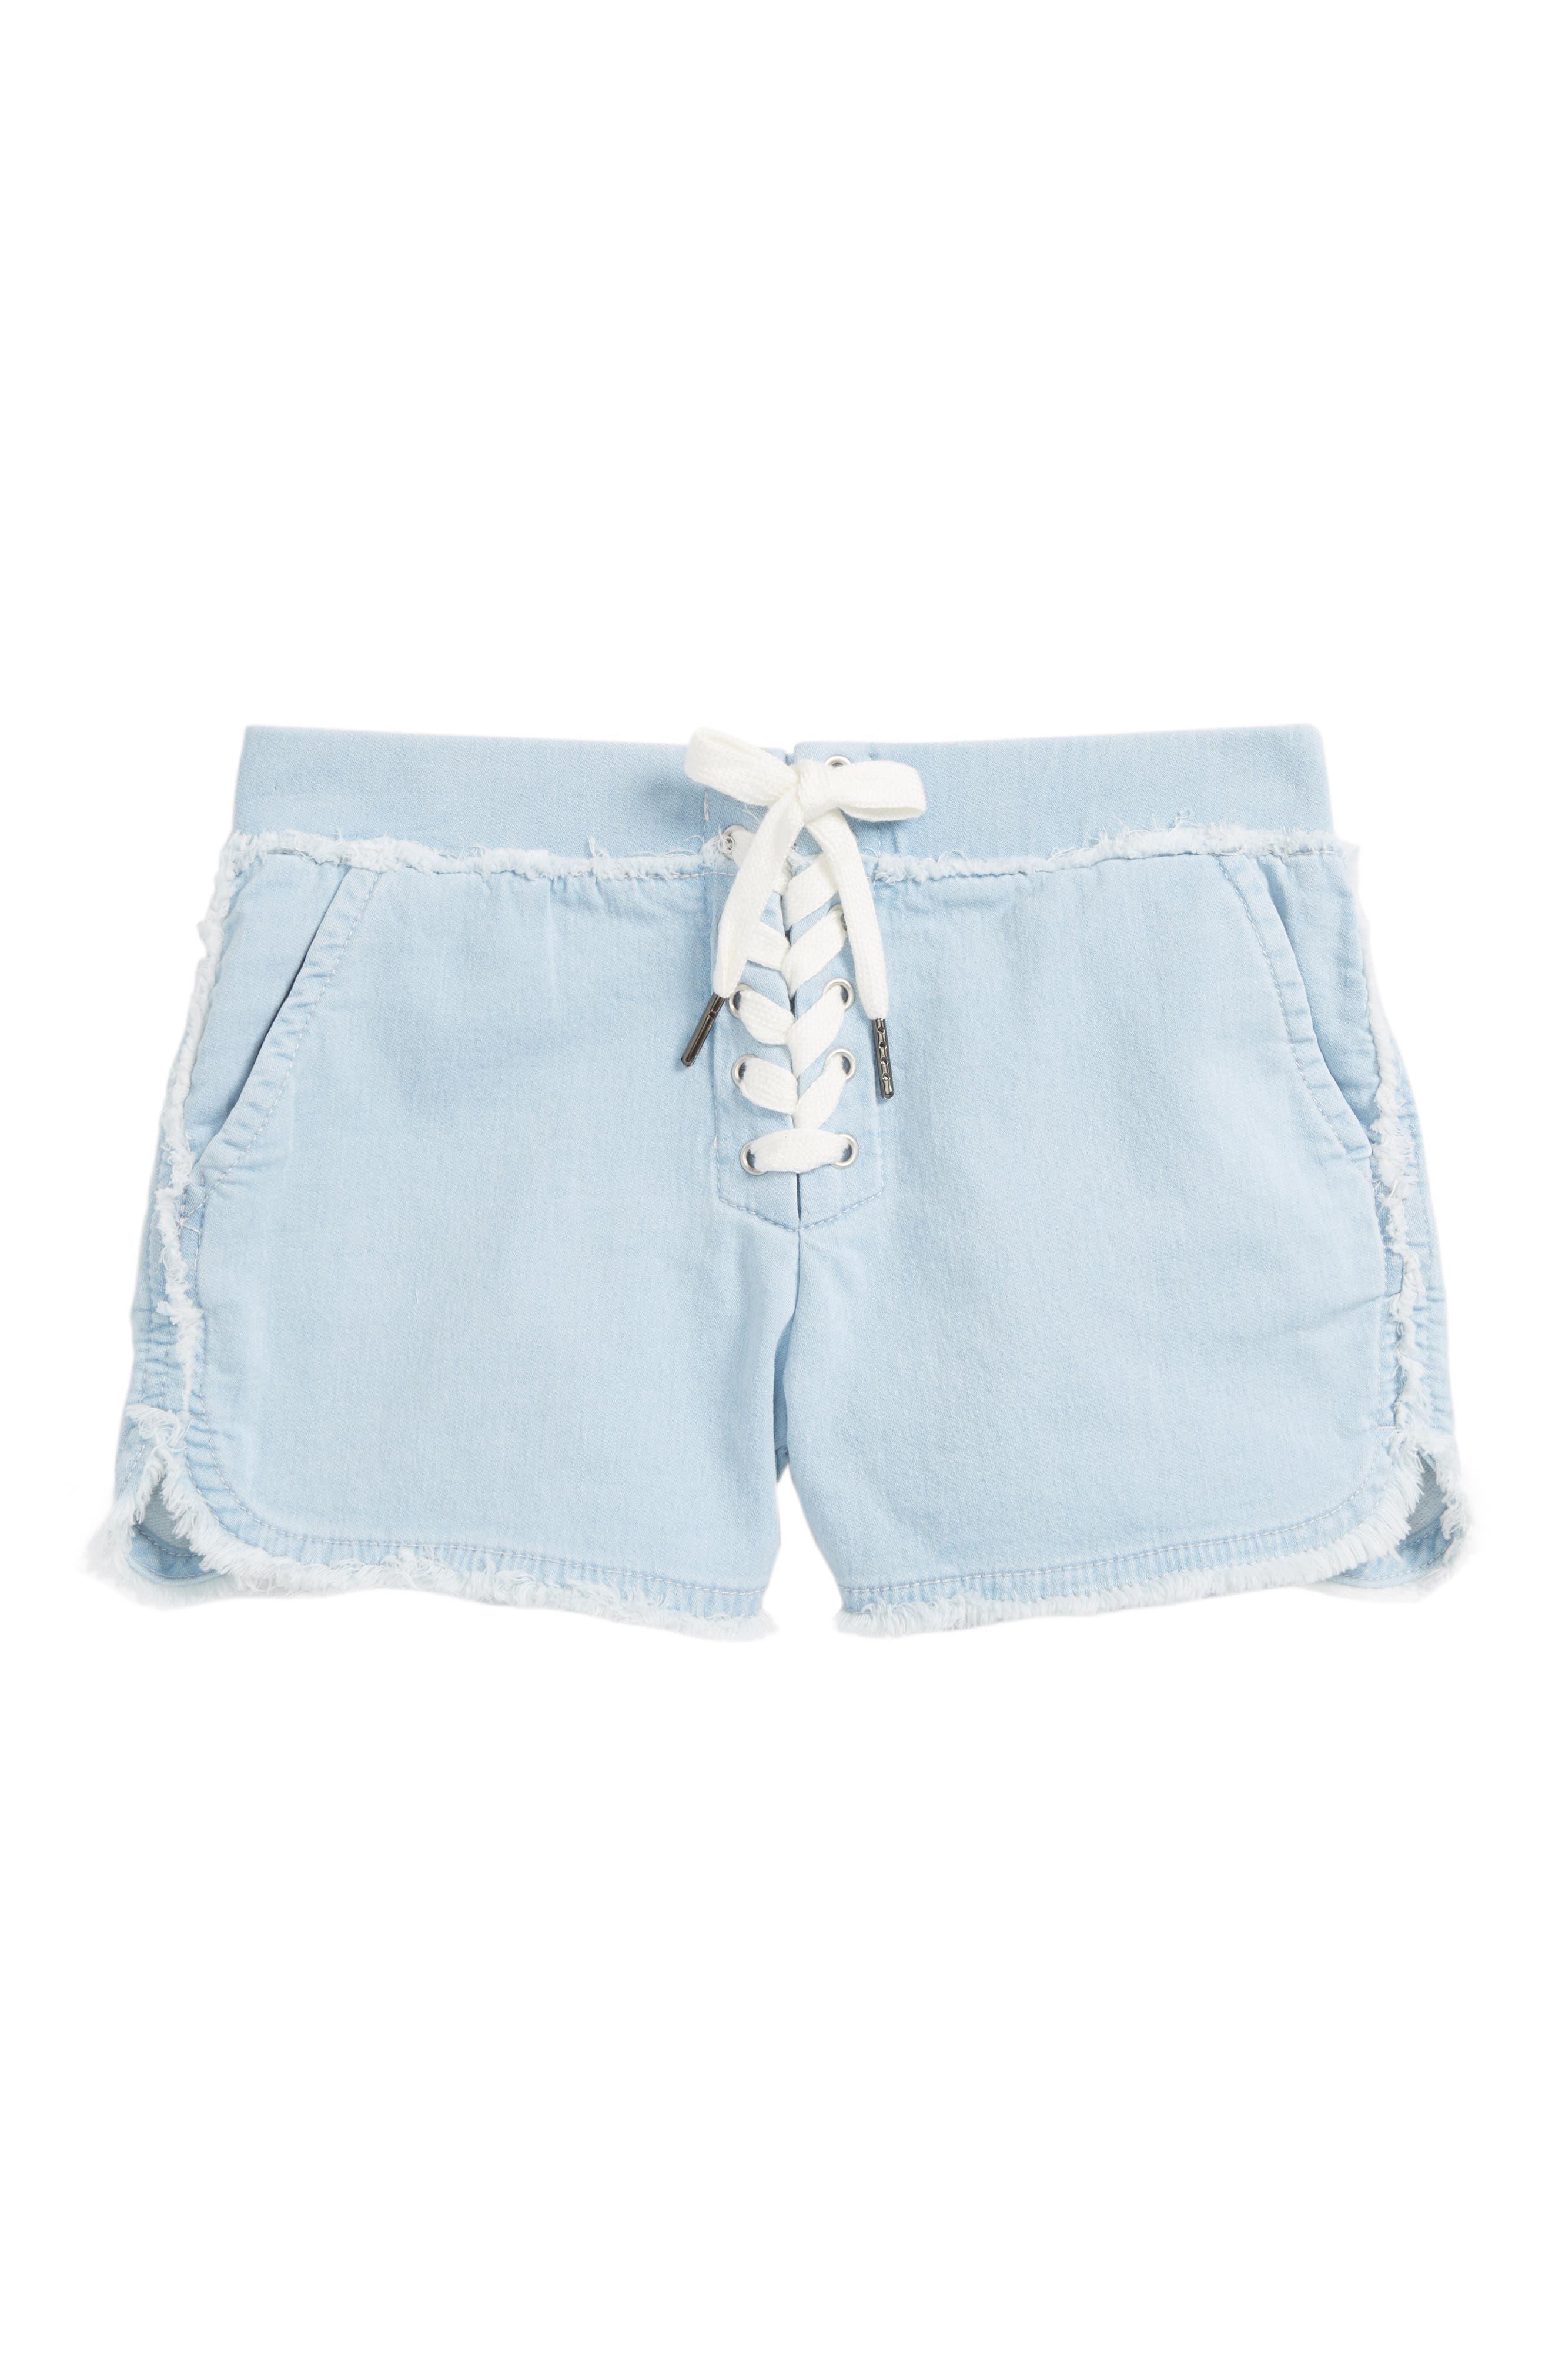 Lace-Up Athletic Chambray Shorts,                             Main thumbnail 1, color,                             Light Blue